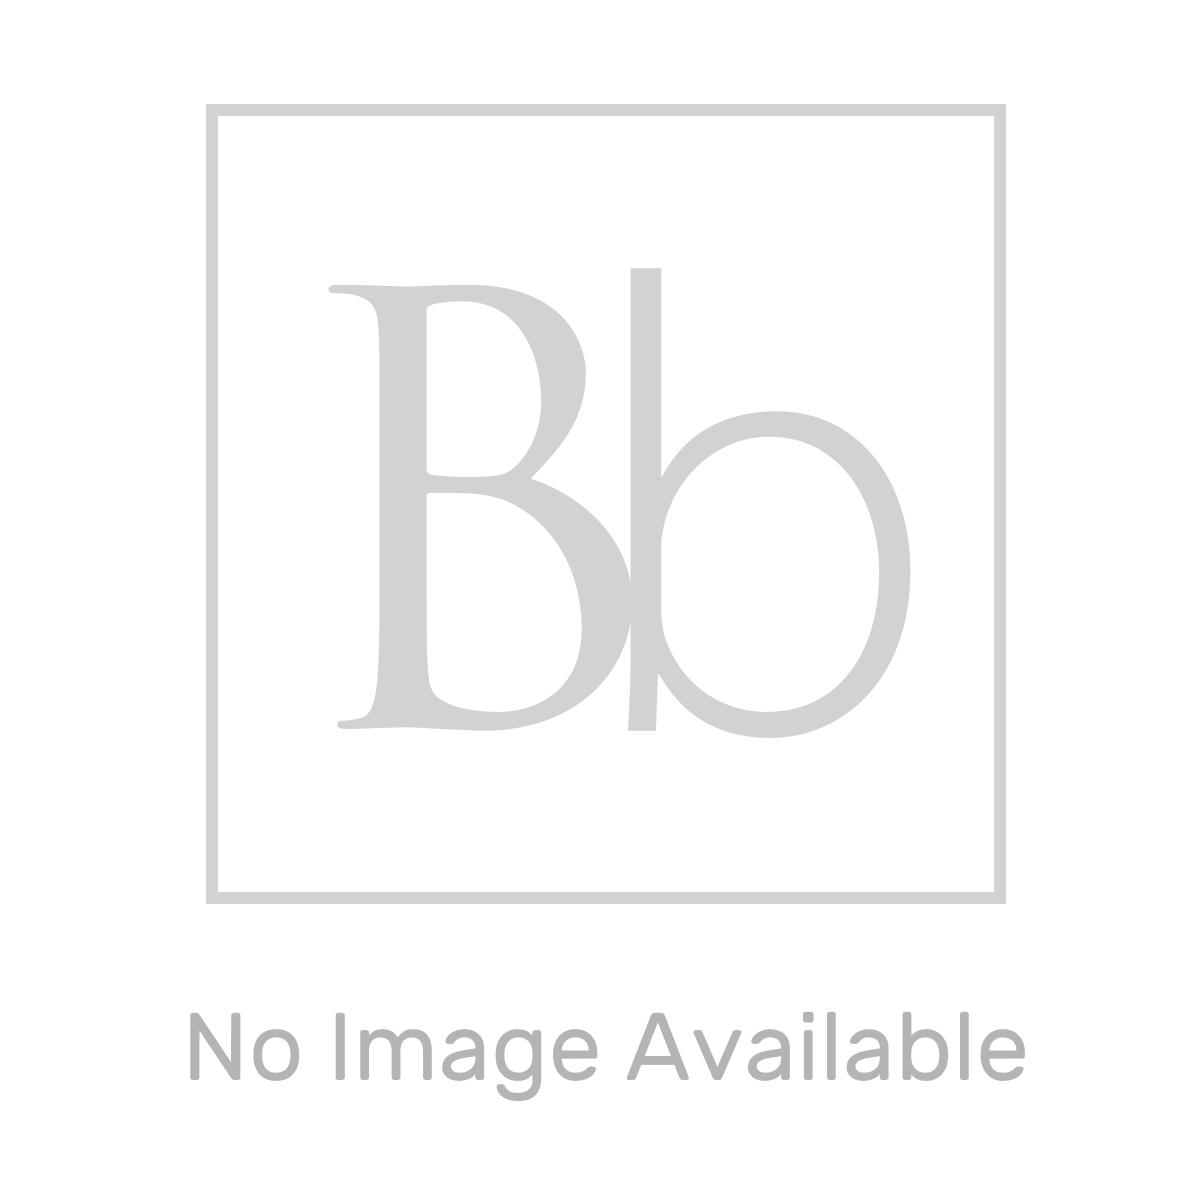 Nuie Athena Grey Avola 2 Drawer Floor Standing Vanity Unit with 18mm Worktop 800mm